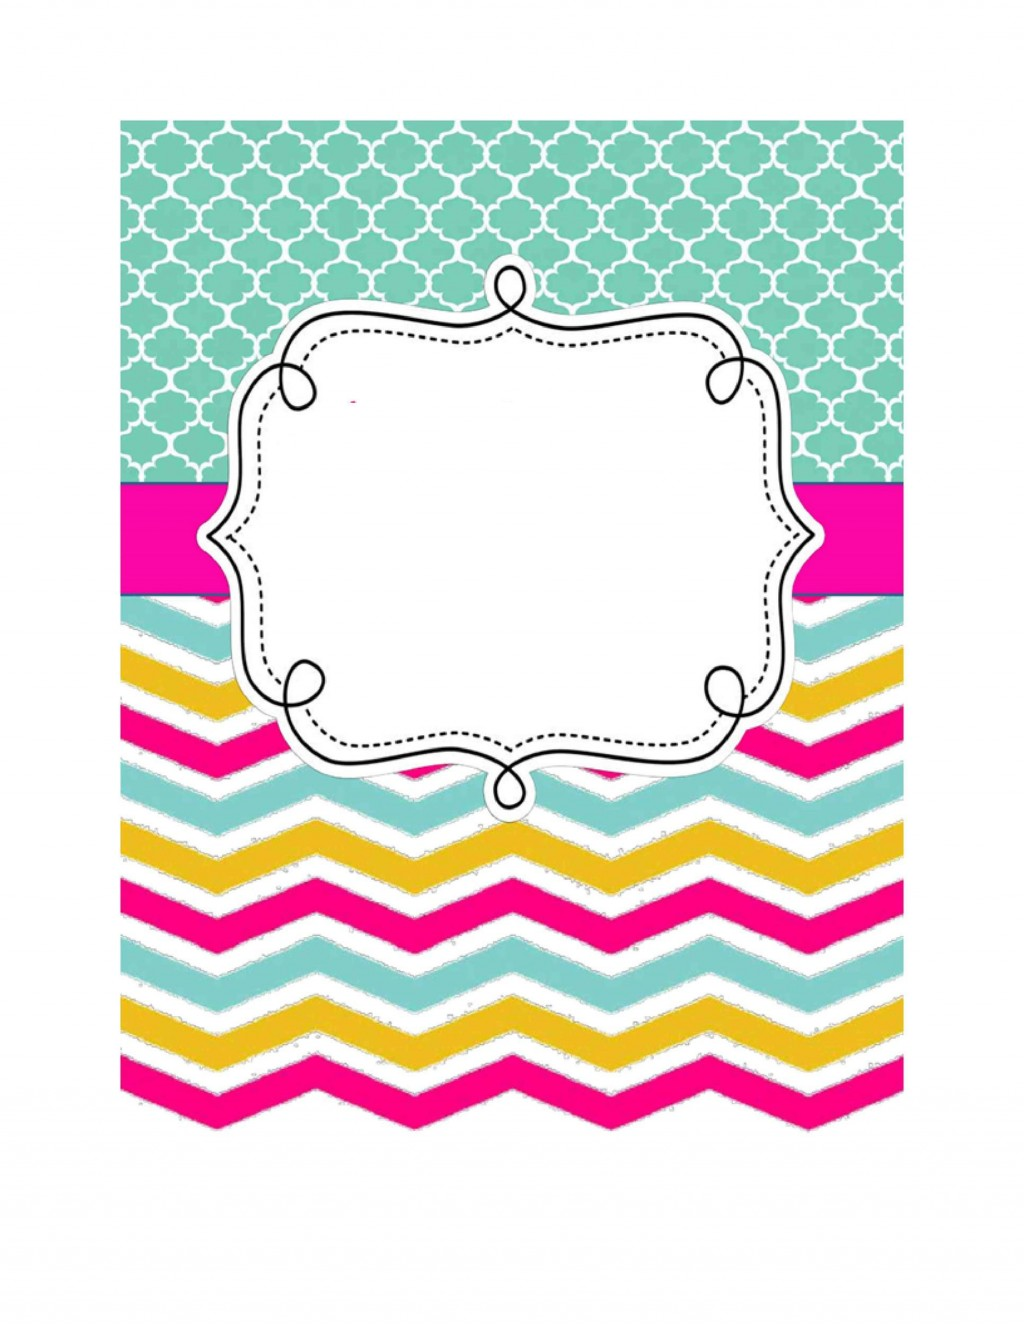 005 Beautiful Cute Binder Cover Template Free Printable Photo Large